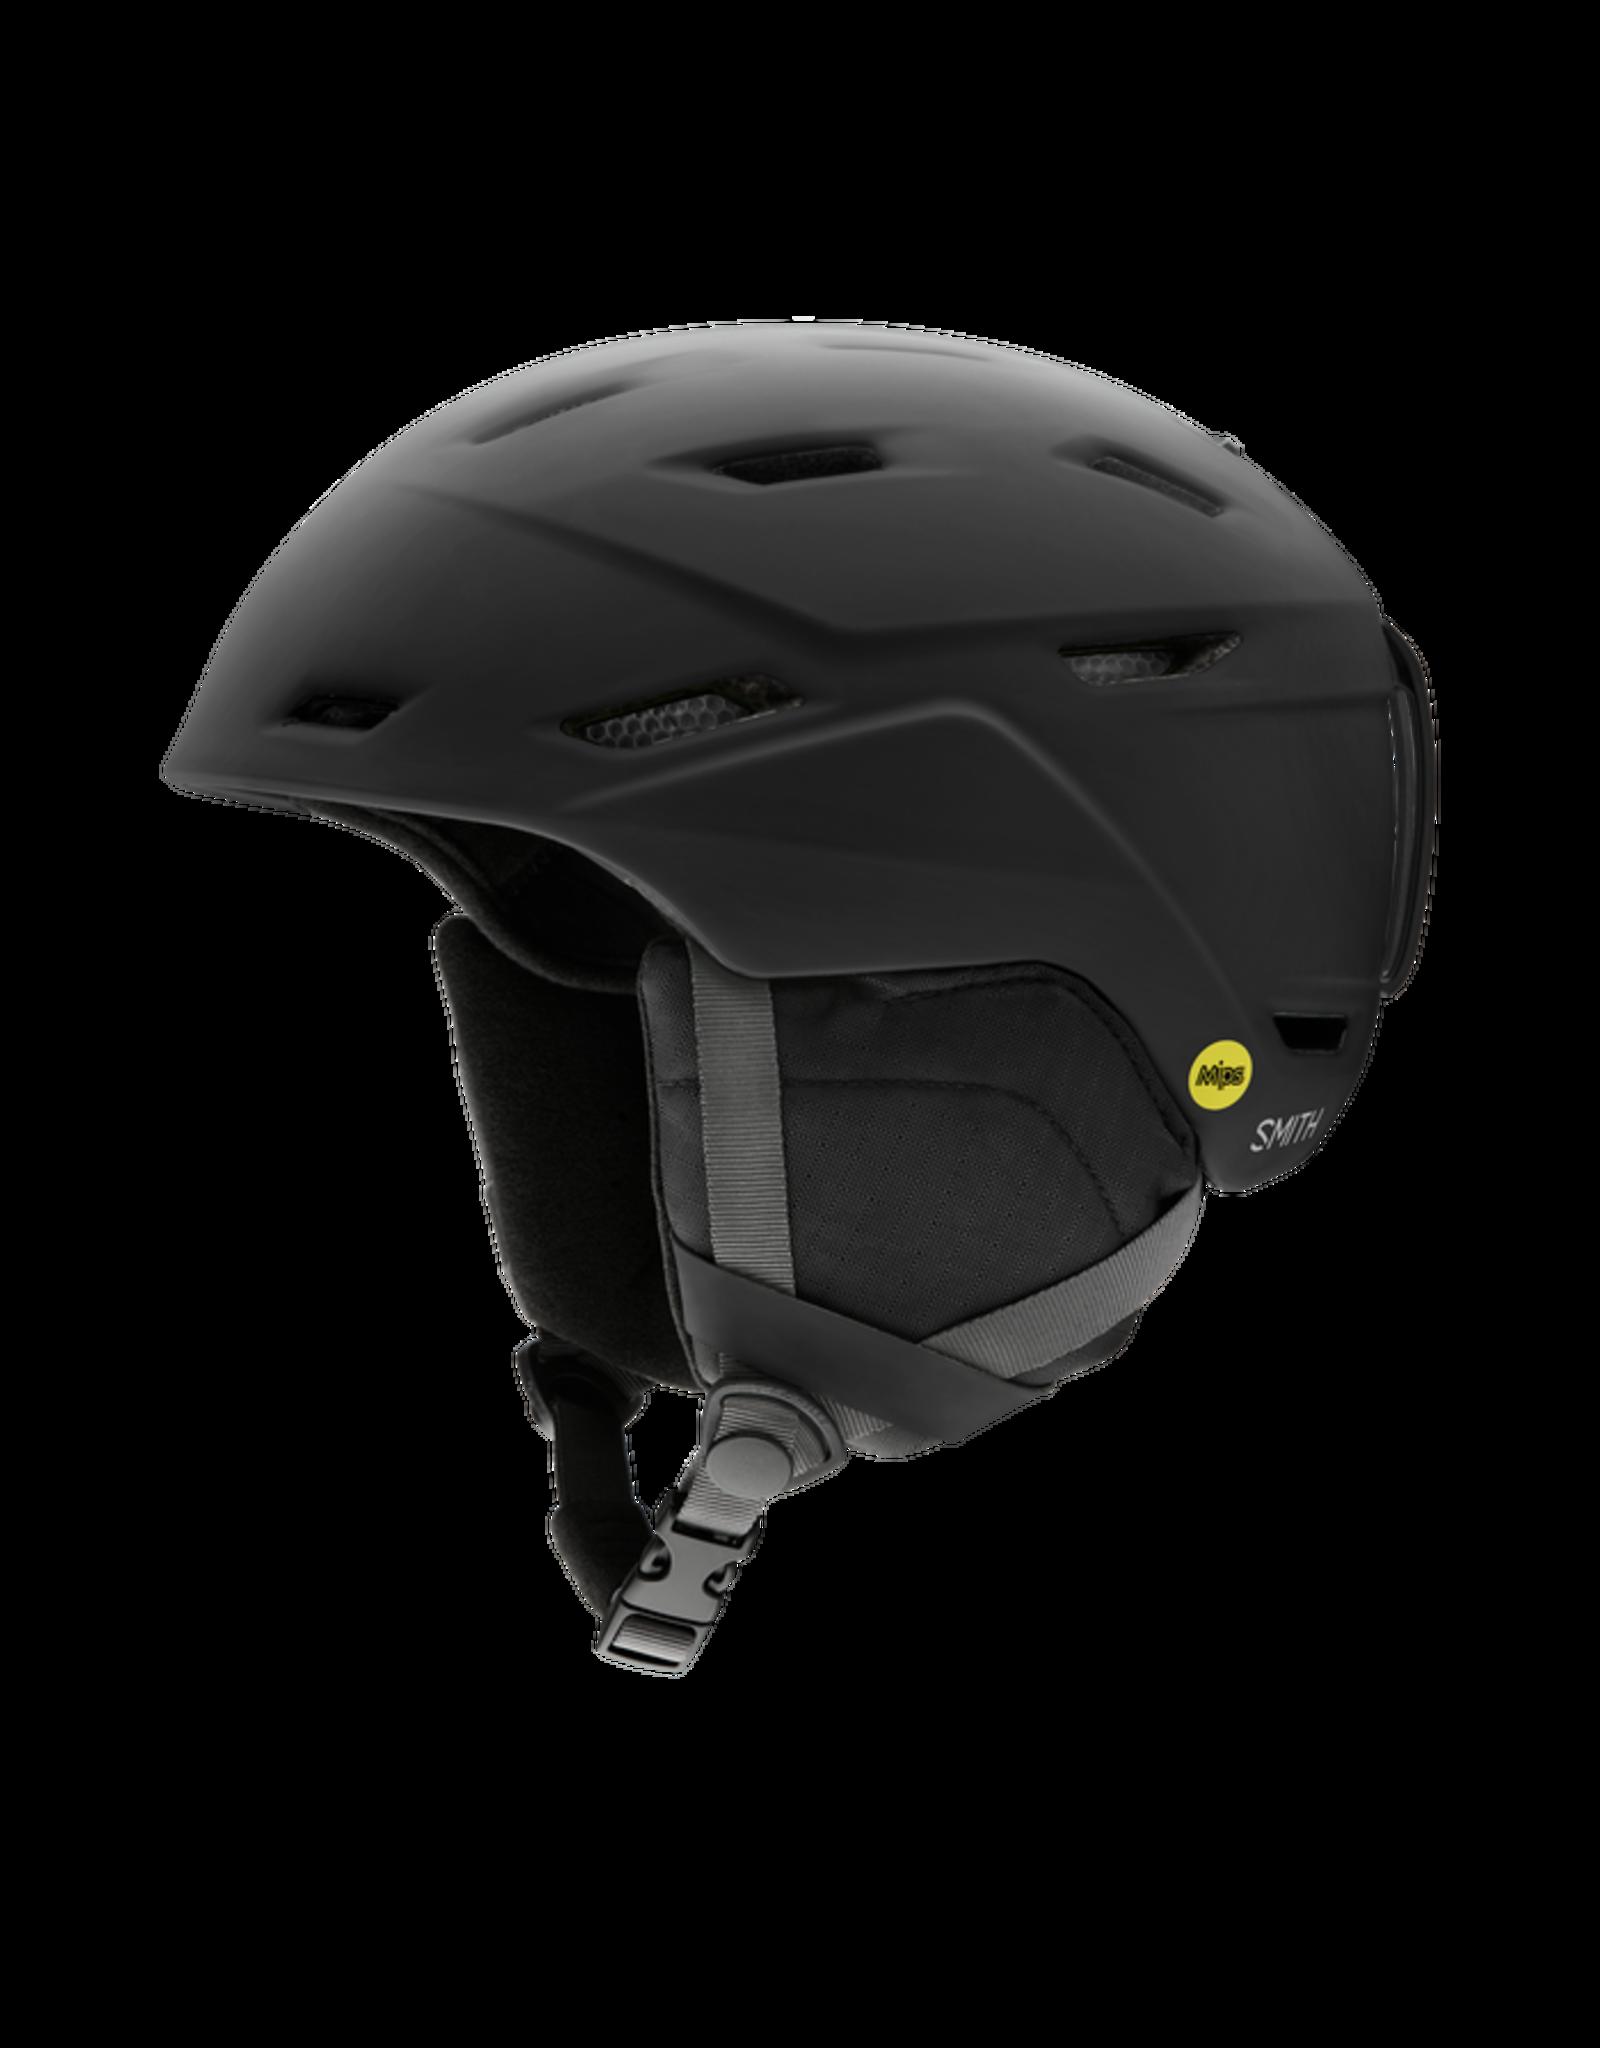 smith optics Smith Mission mips helmet - Matte black - Medium 55-59 cm